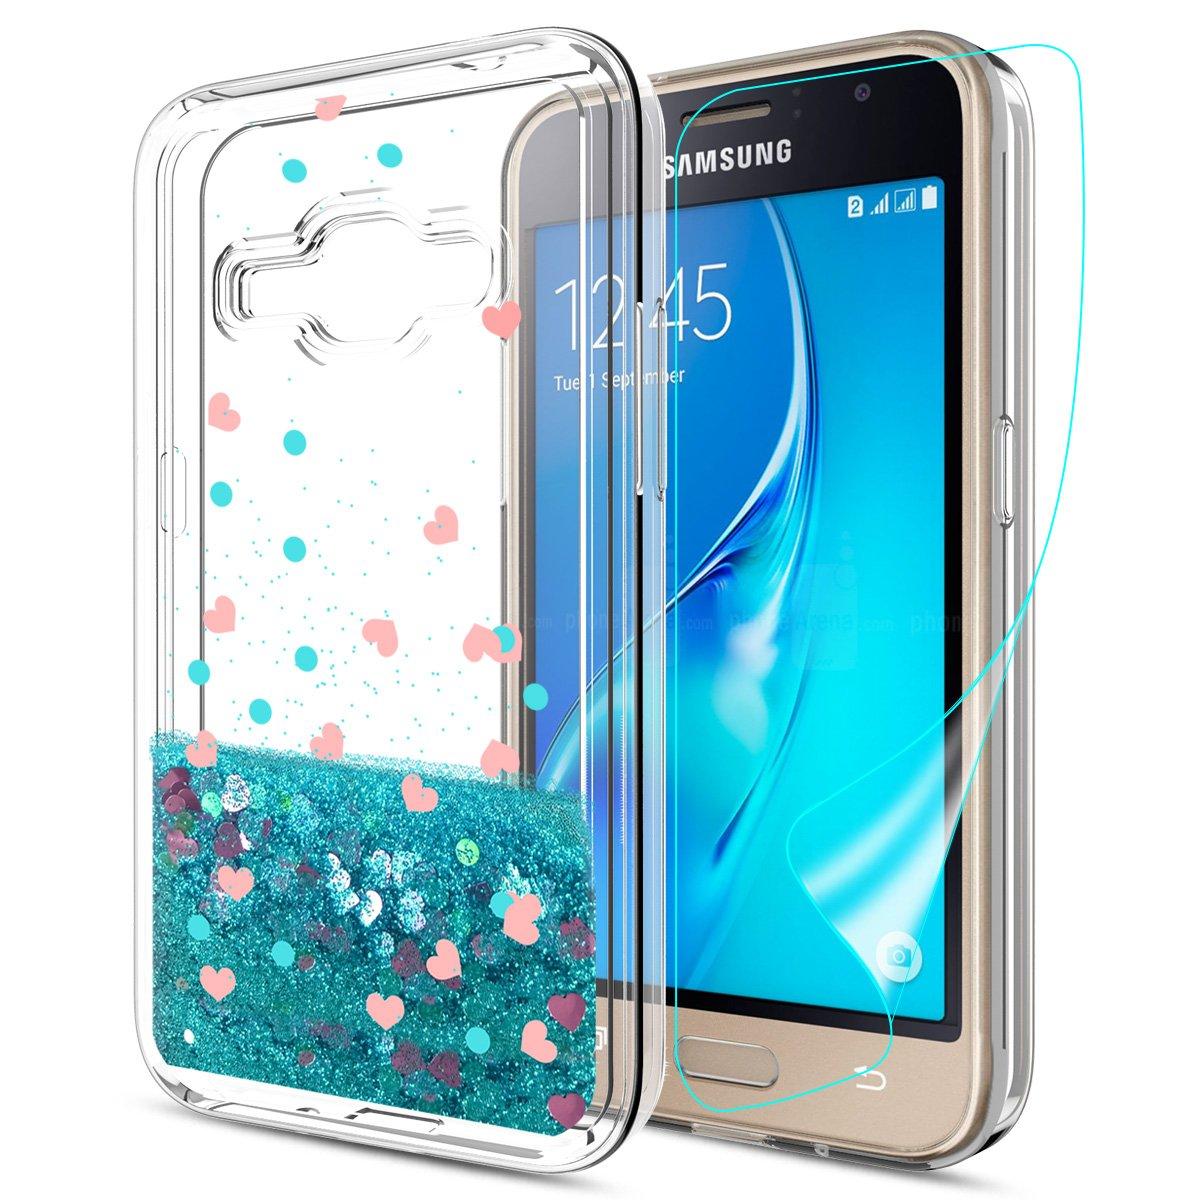 brand new 19c14 7568a Galaxy Express 3 Case, Galaxy Luna Case, Galaxy J1 2016 Case, Galaxy Amp  2?Case With HD Screen Protector For girls,Slook Liquid Glitter TPU Cute  Phone ...